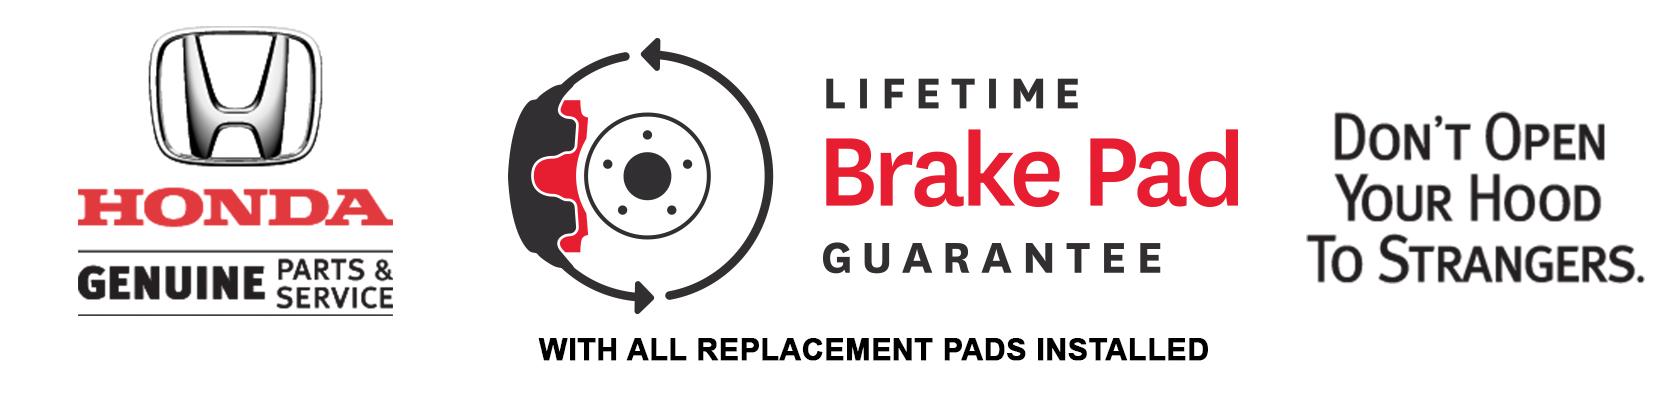 Lifetime brake pad gurantee